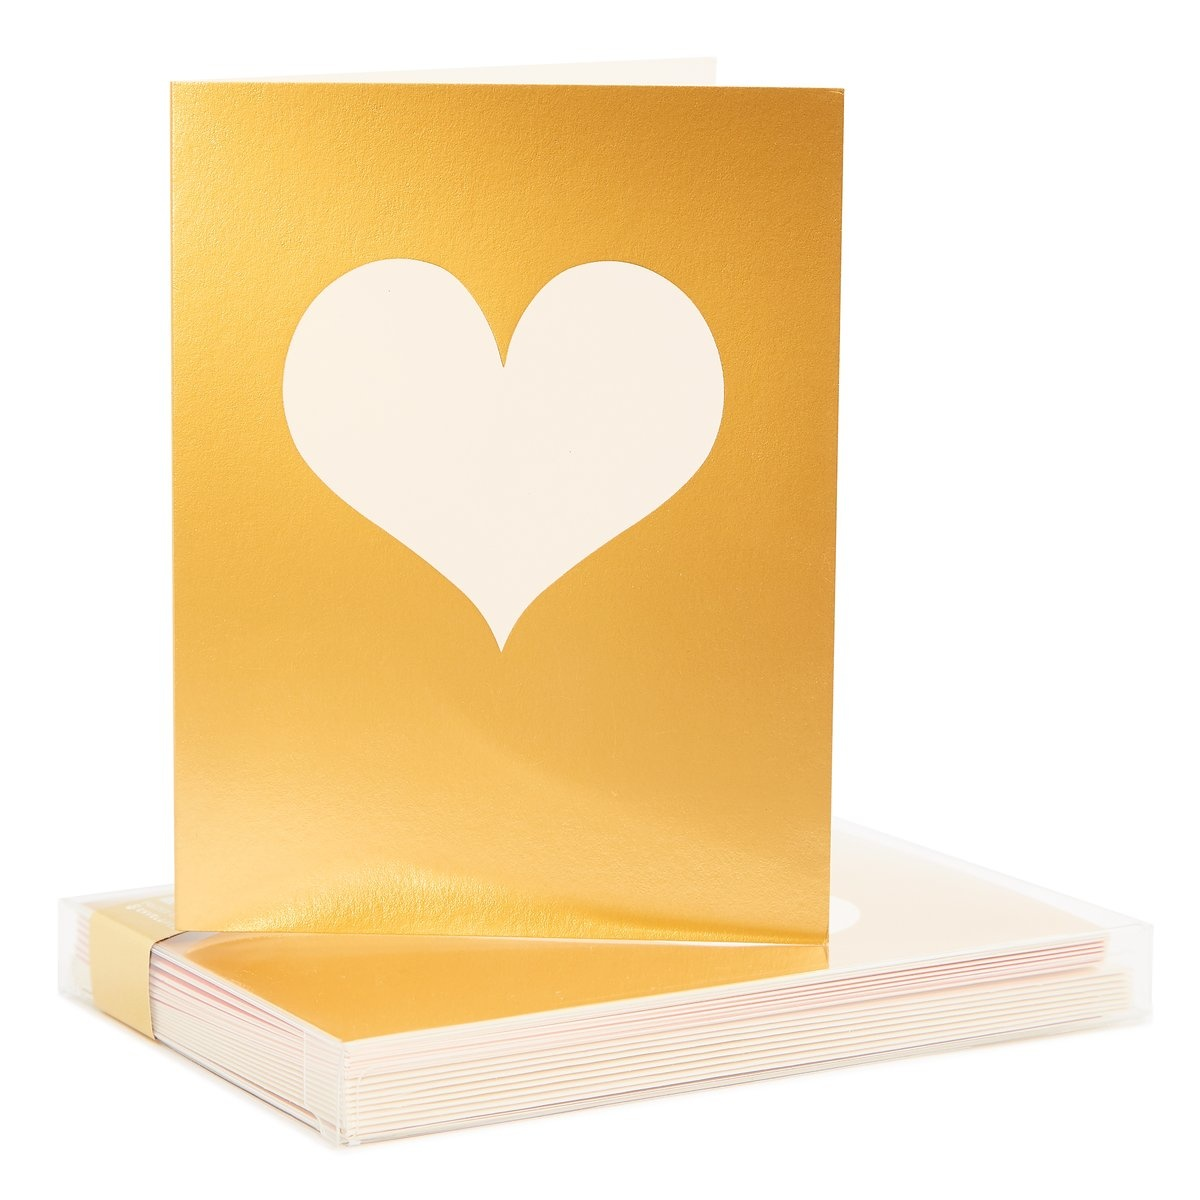 Snow & Graham #141 Gold Heart